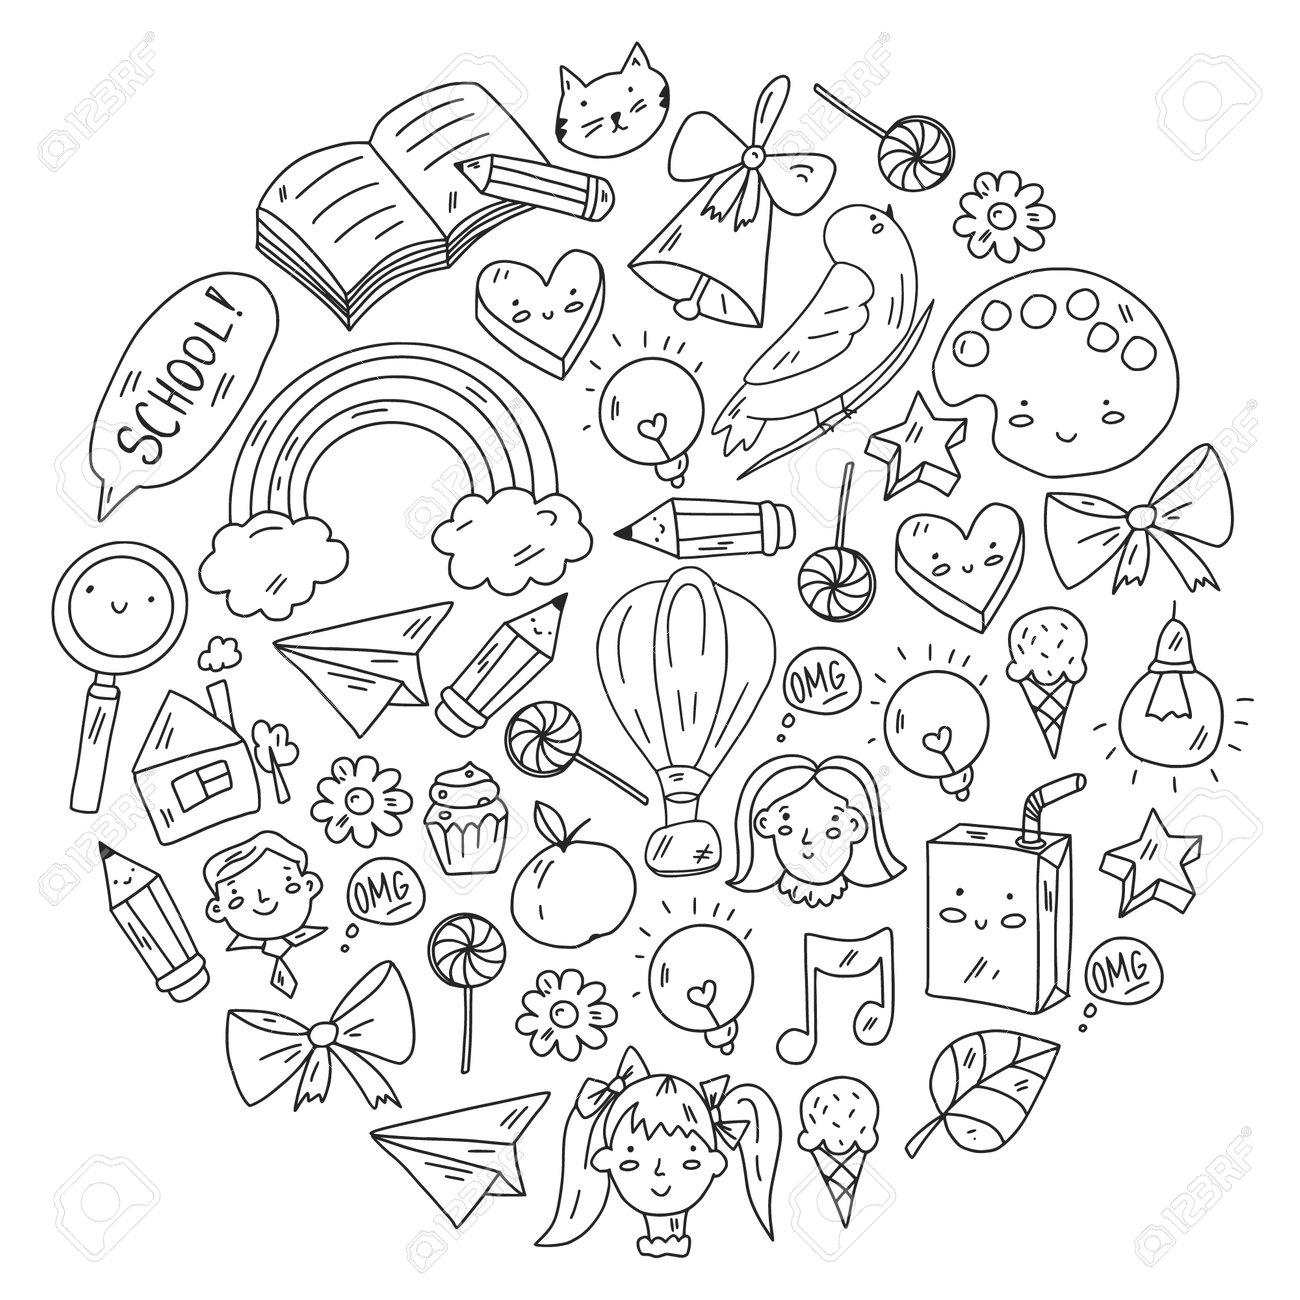 School, kindergarten with cute vector children. Creativity and imagination. Dancing, singing, painting, online education. - 173370723